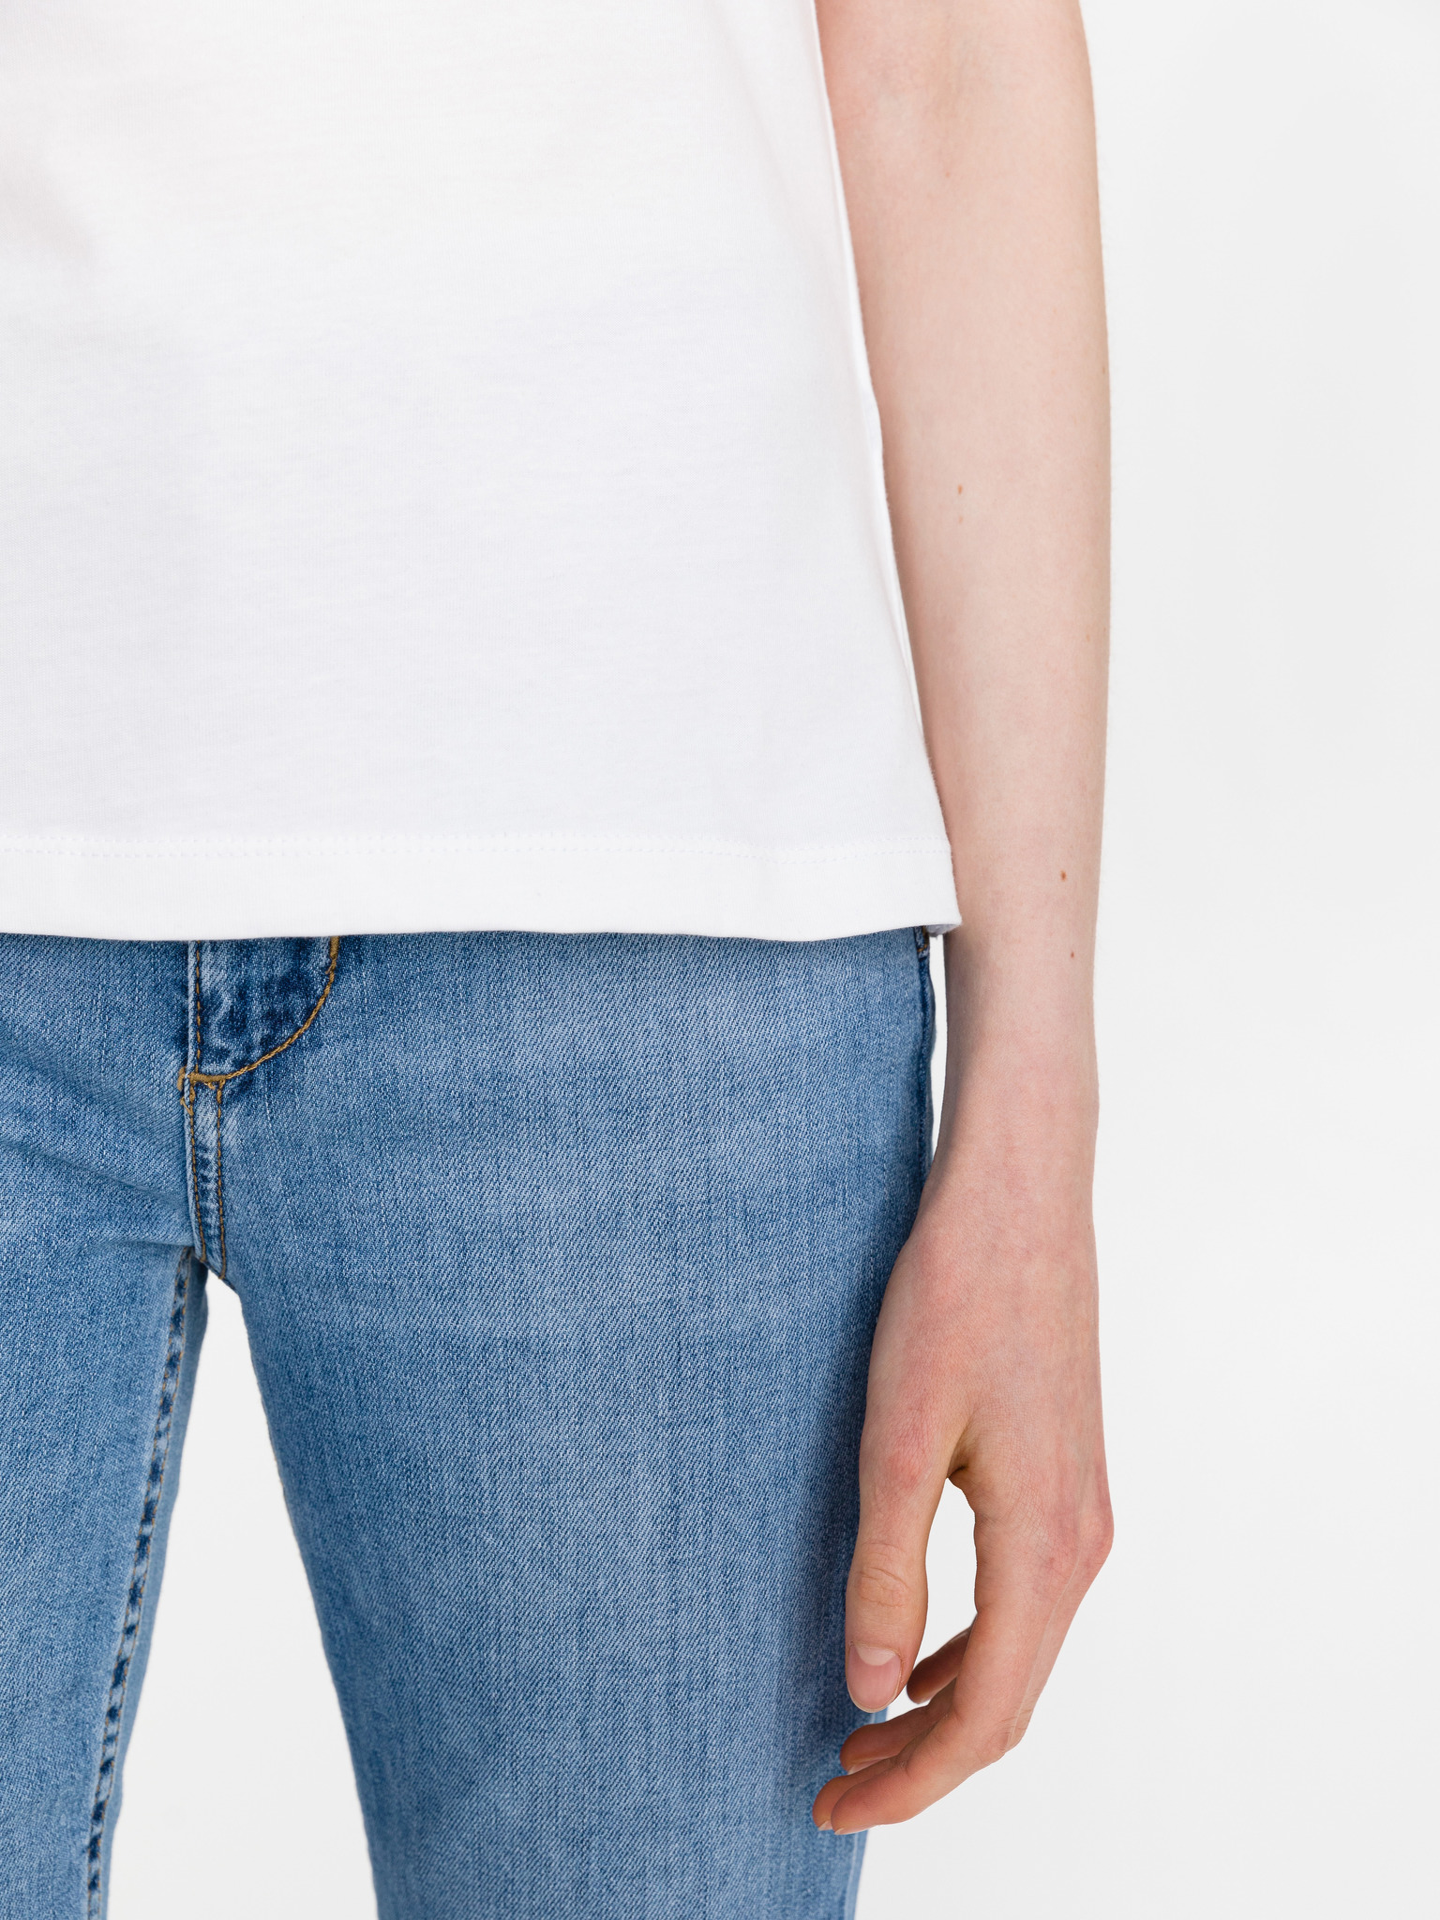 Guess bianco maglietta Beauty